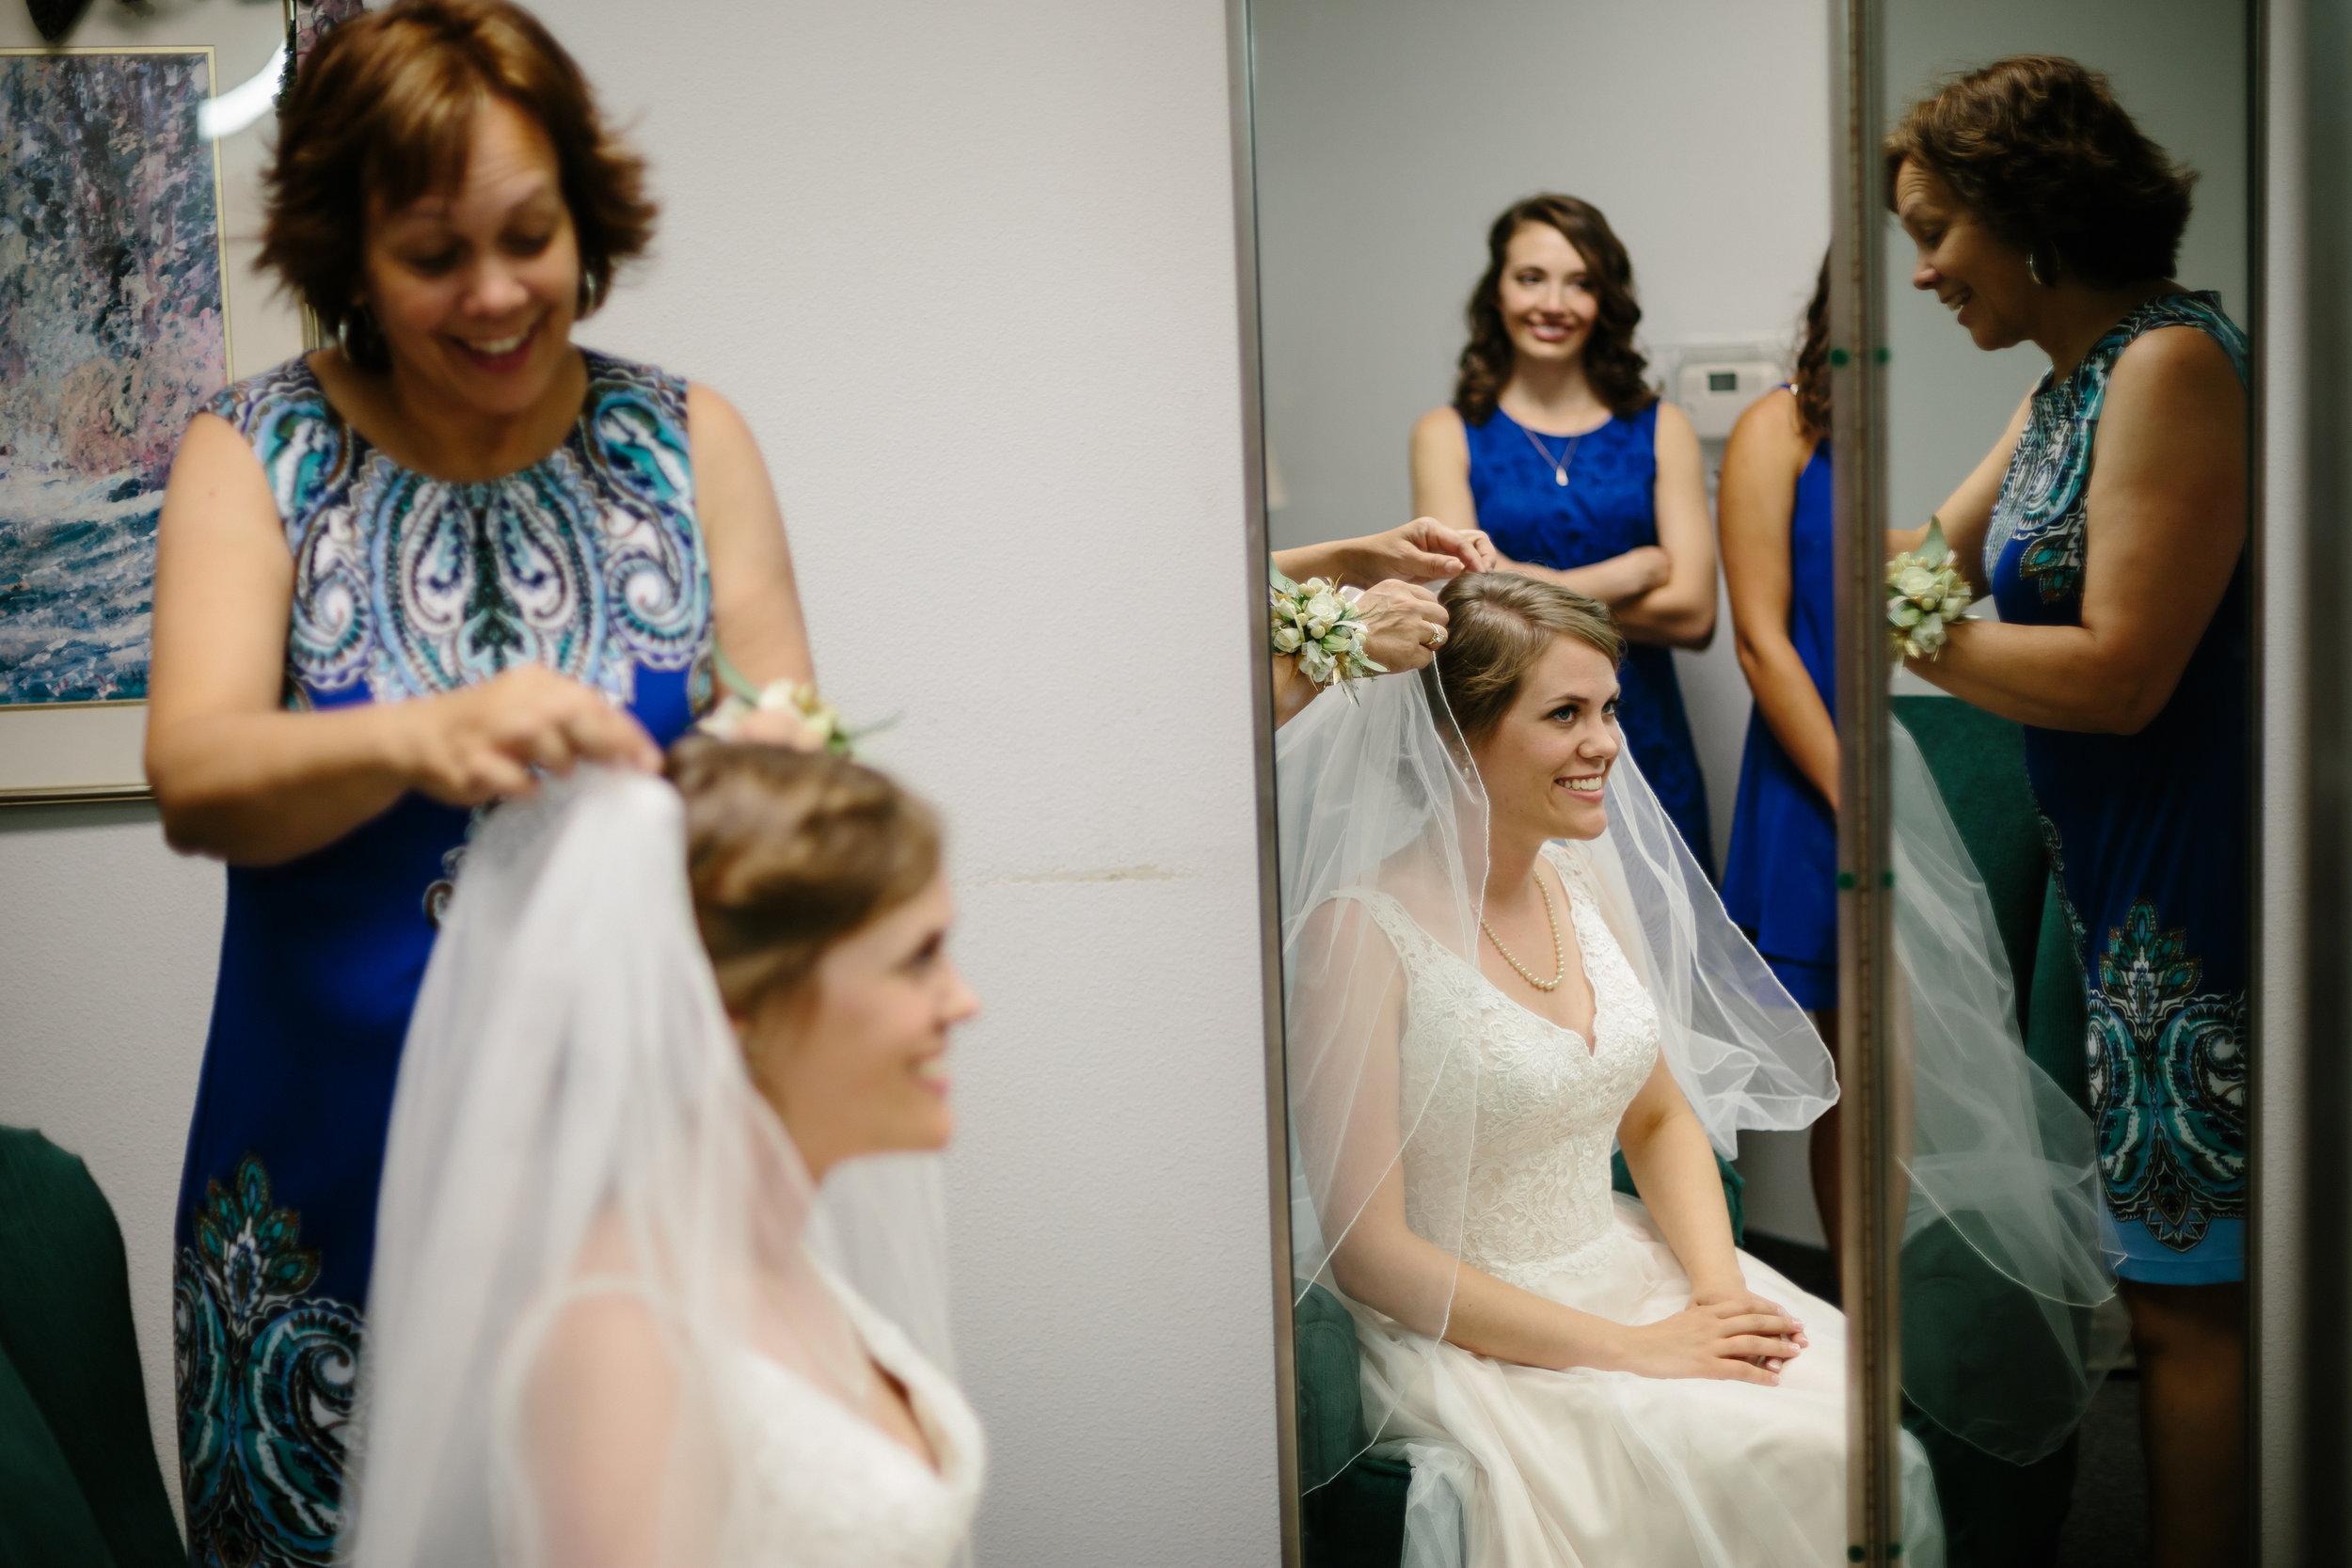 Jordan & Shantel Married - Idaho - Corrie Mick Photography-52.jpg